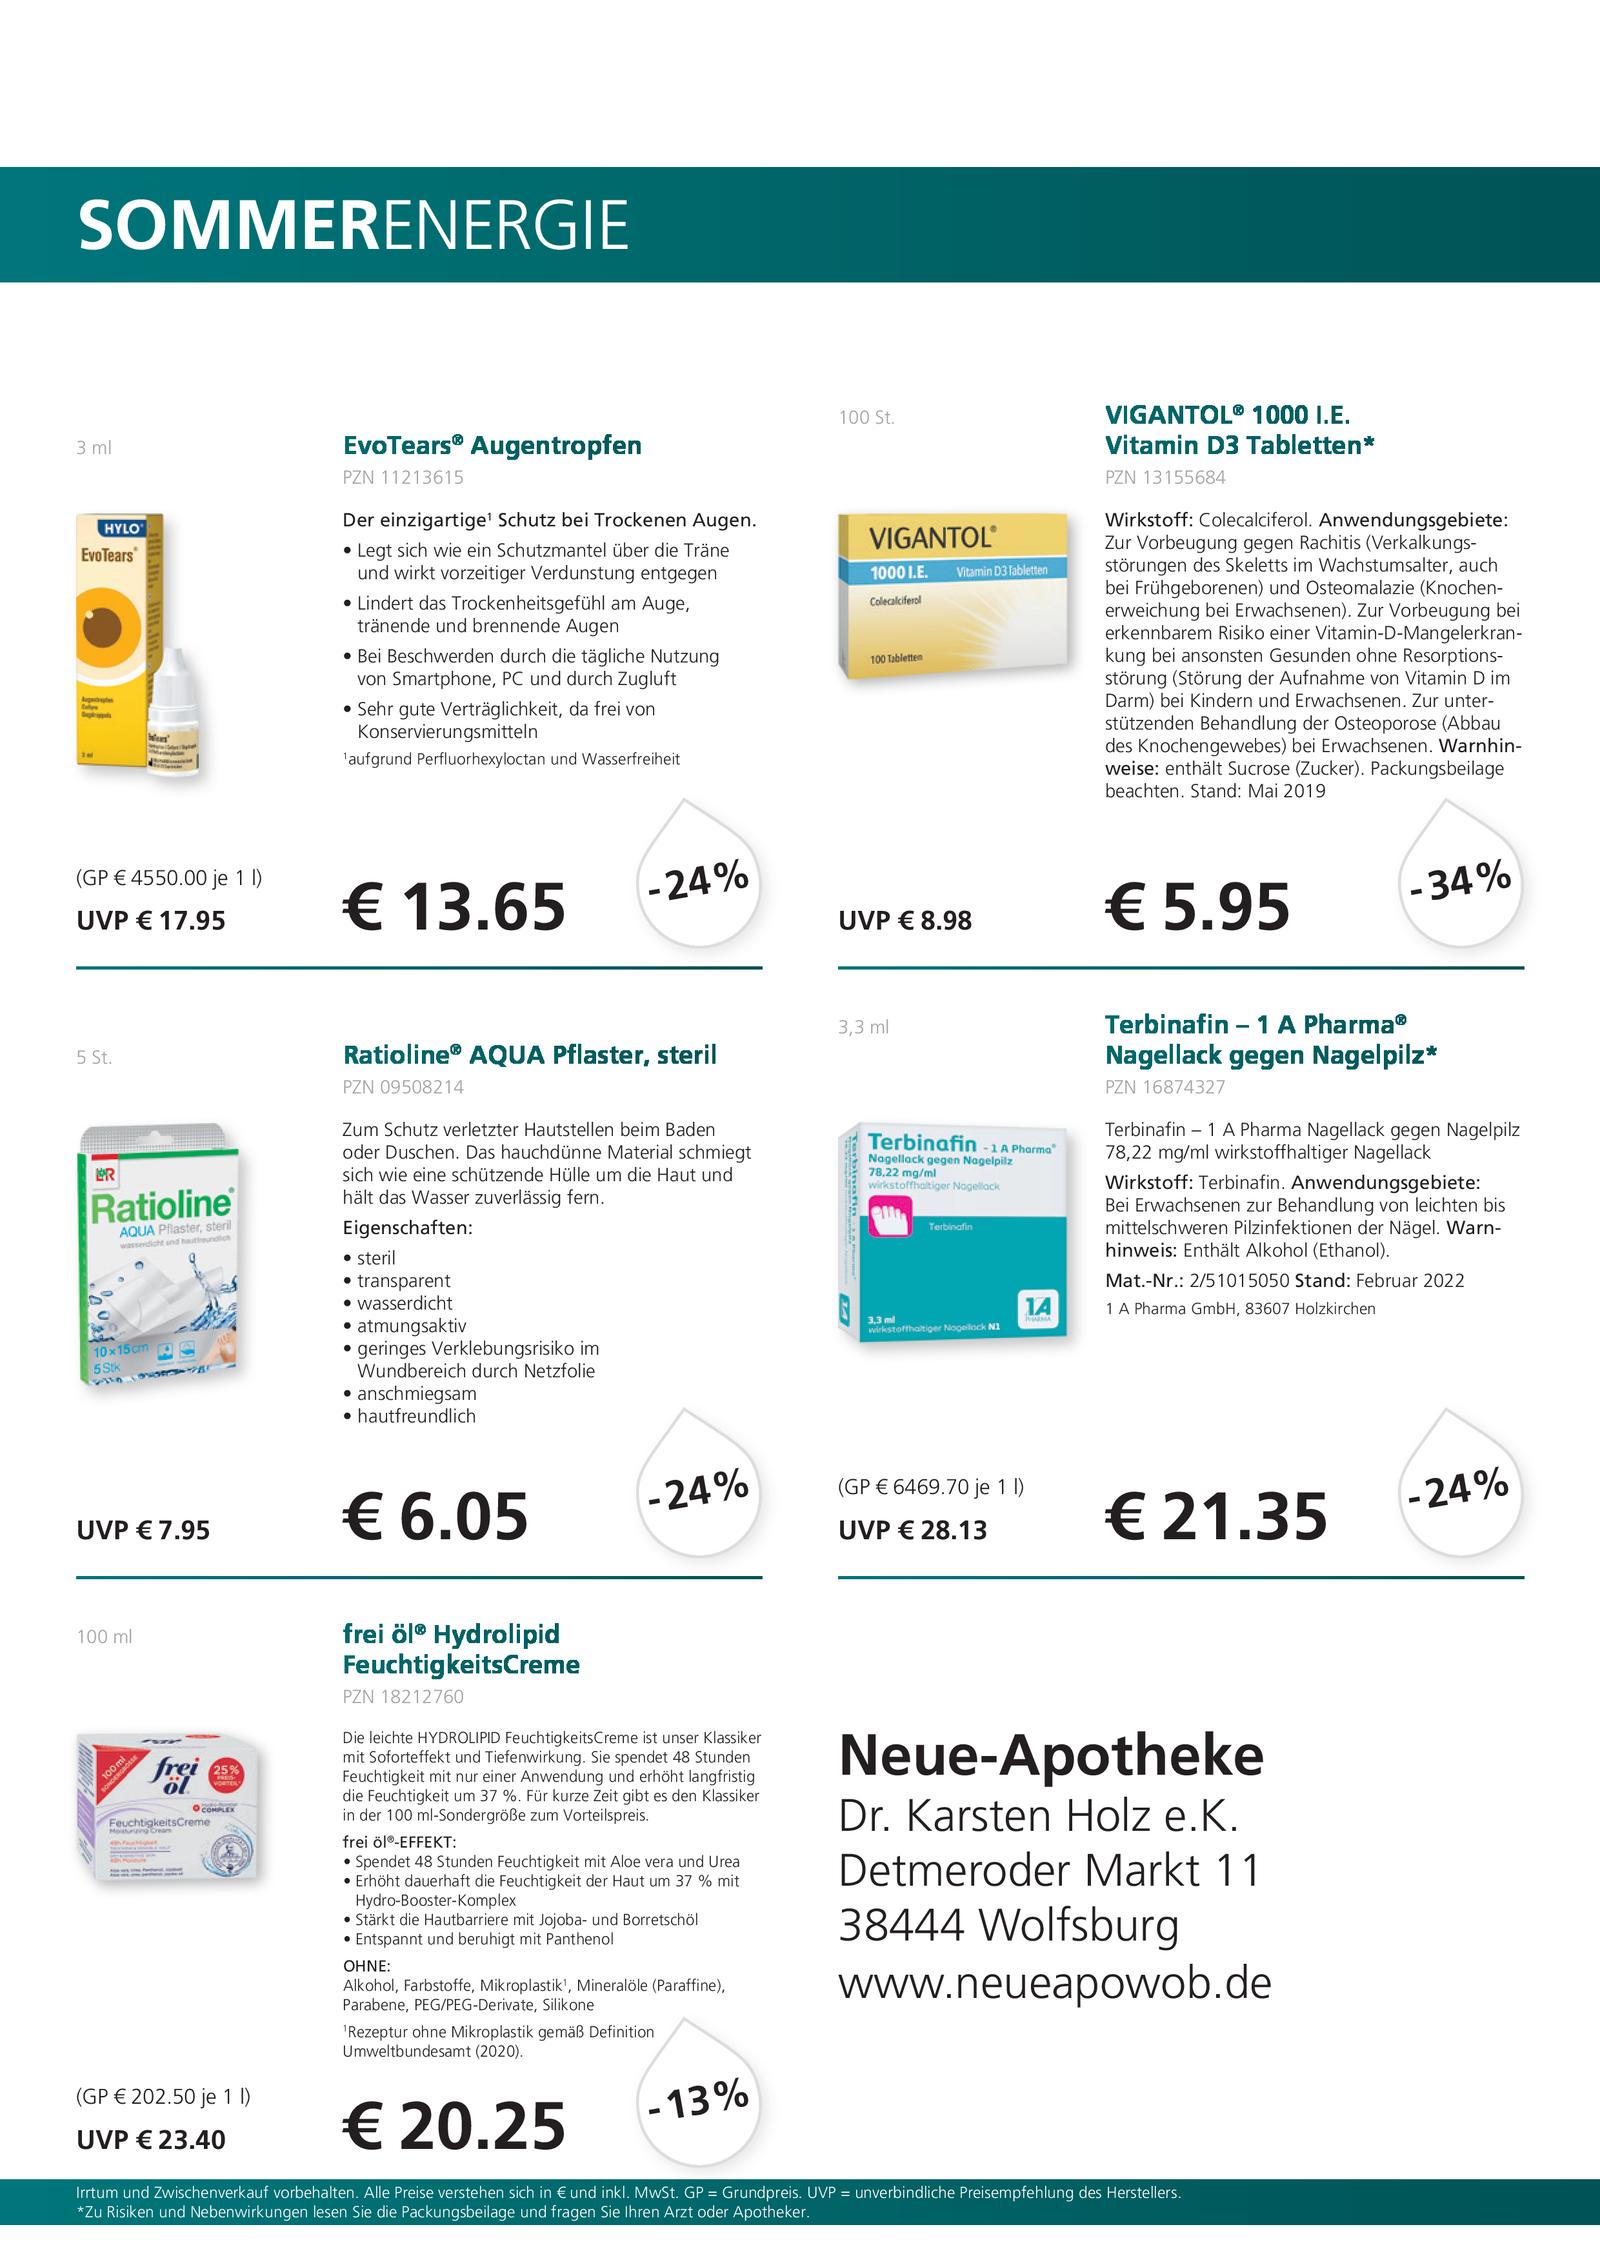 https://mein-uploads.apocdn.net/8089/leaflets/8089_flyer-Seite4.png